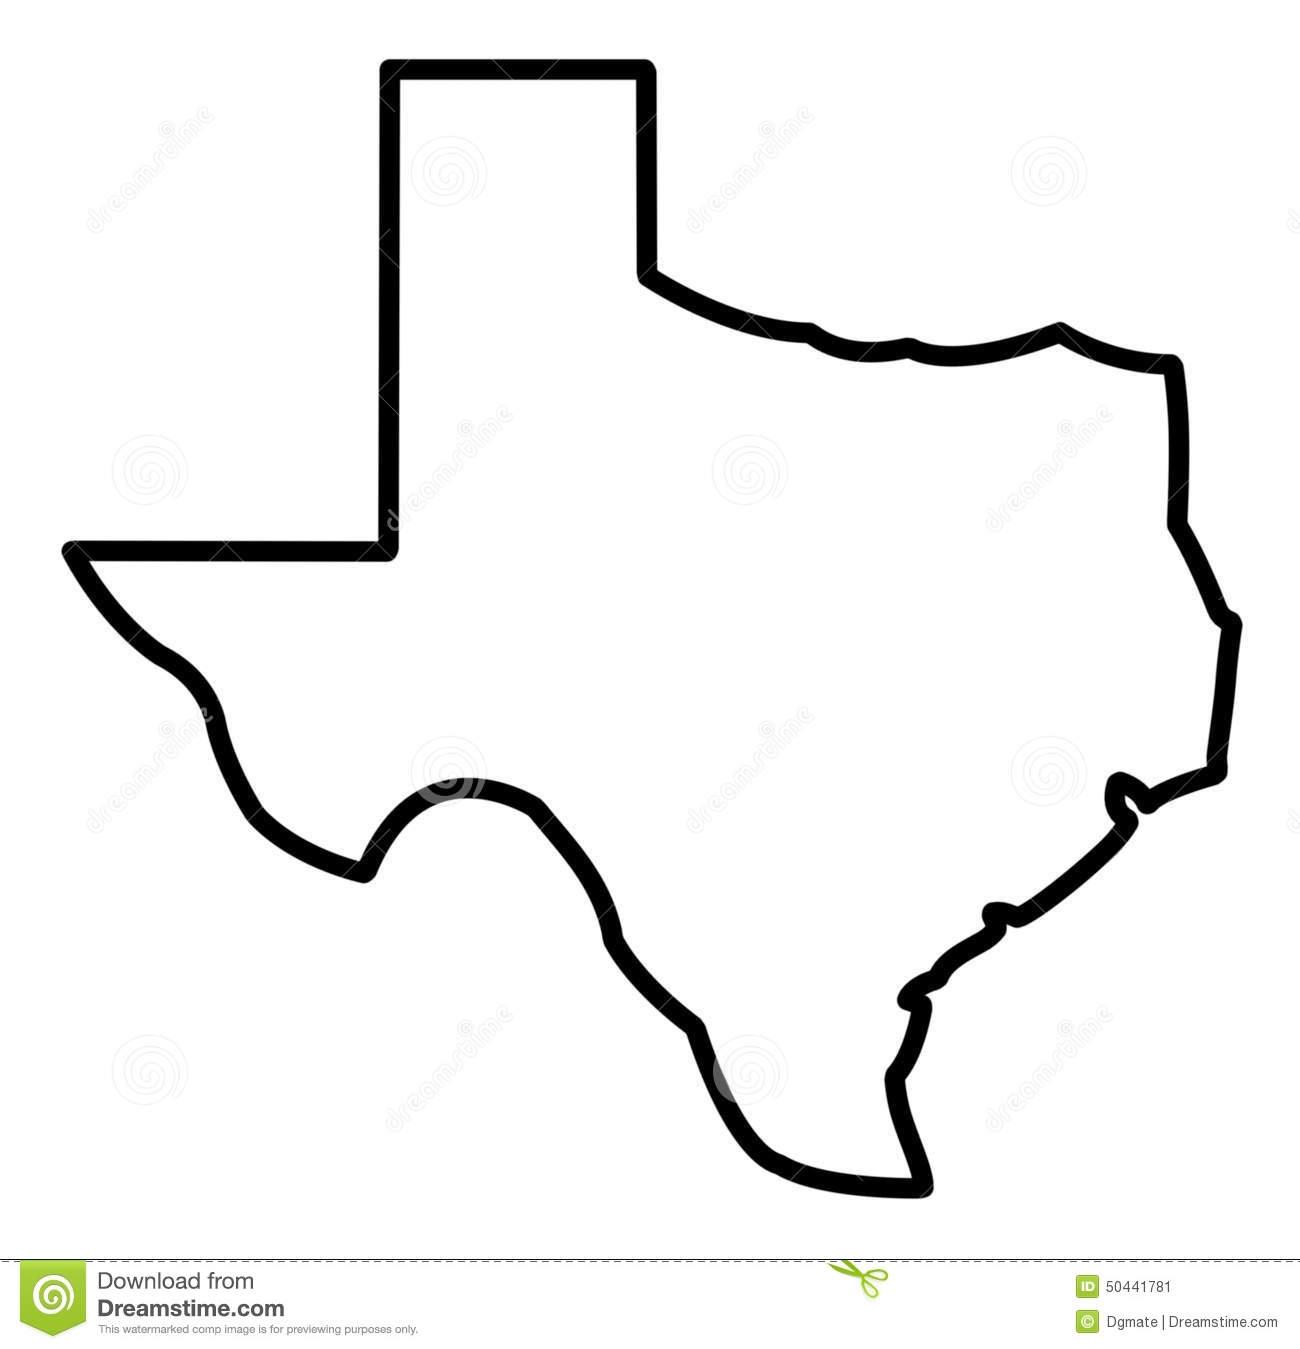 Free, Clip Art. Texas Map .-free, clip art. Texas Map .-3